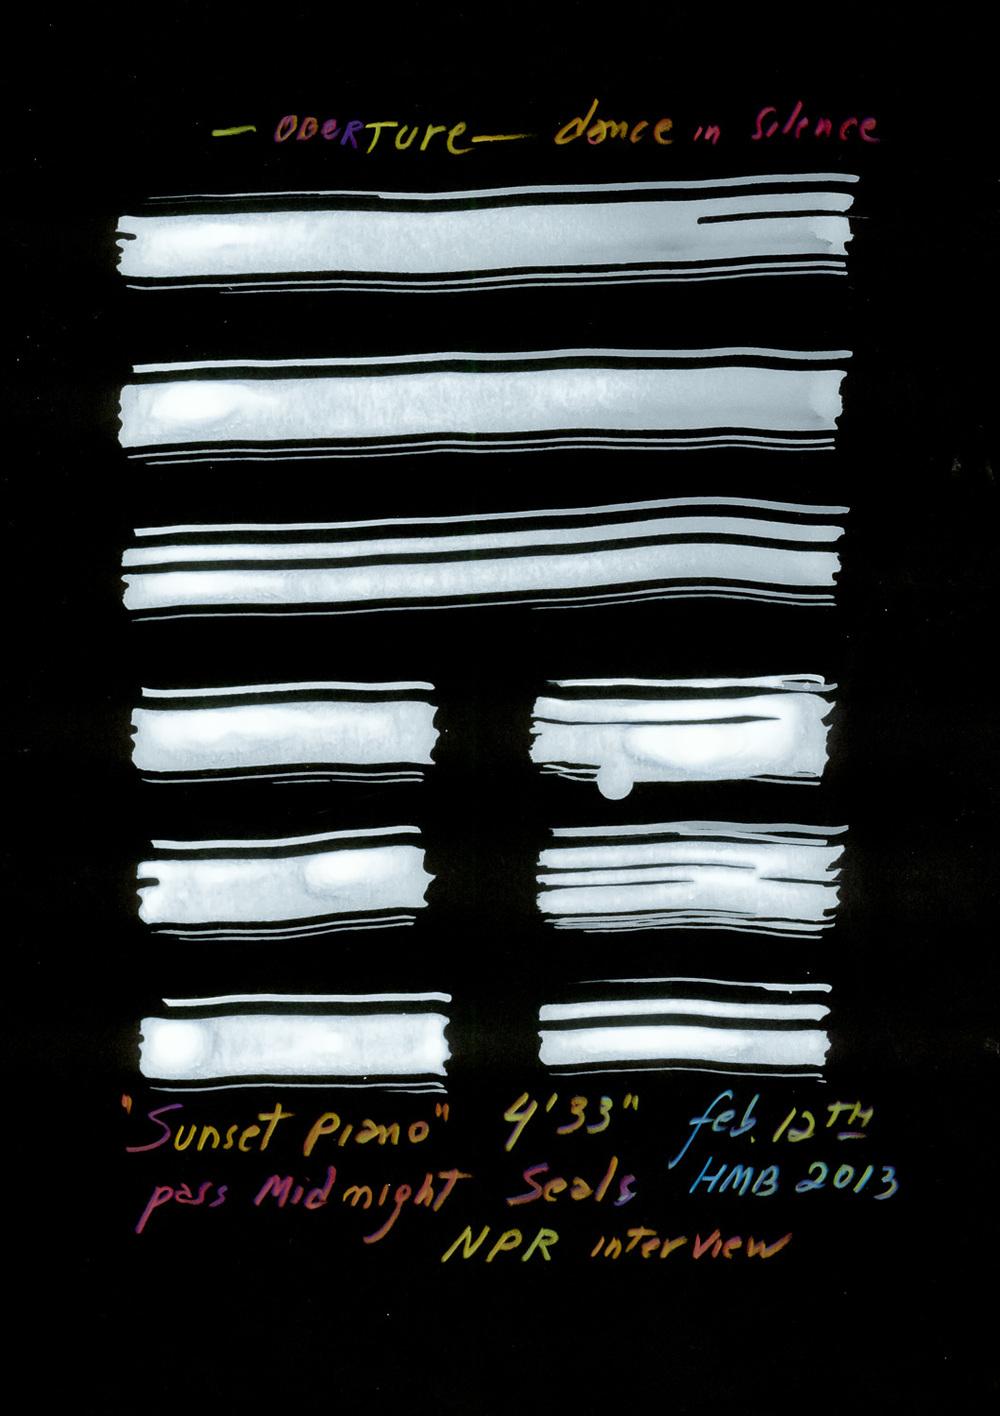 Mauro-Opus1-Notation-21.jpg